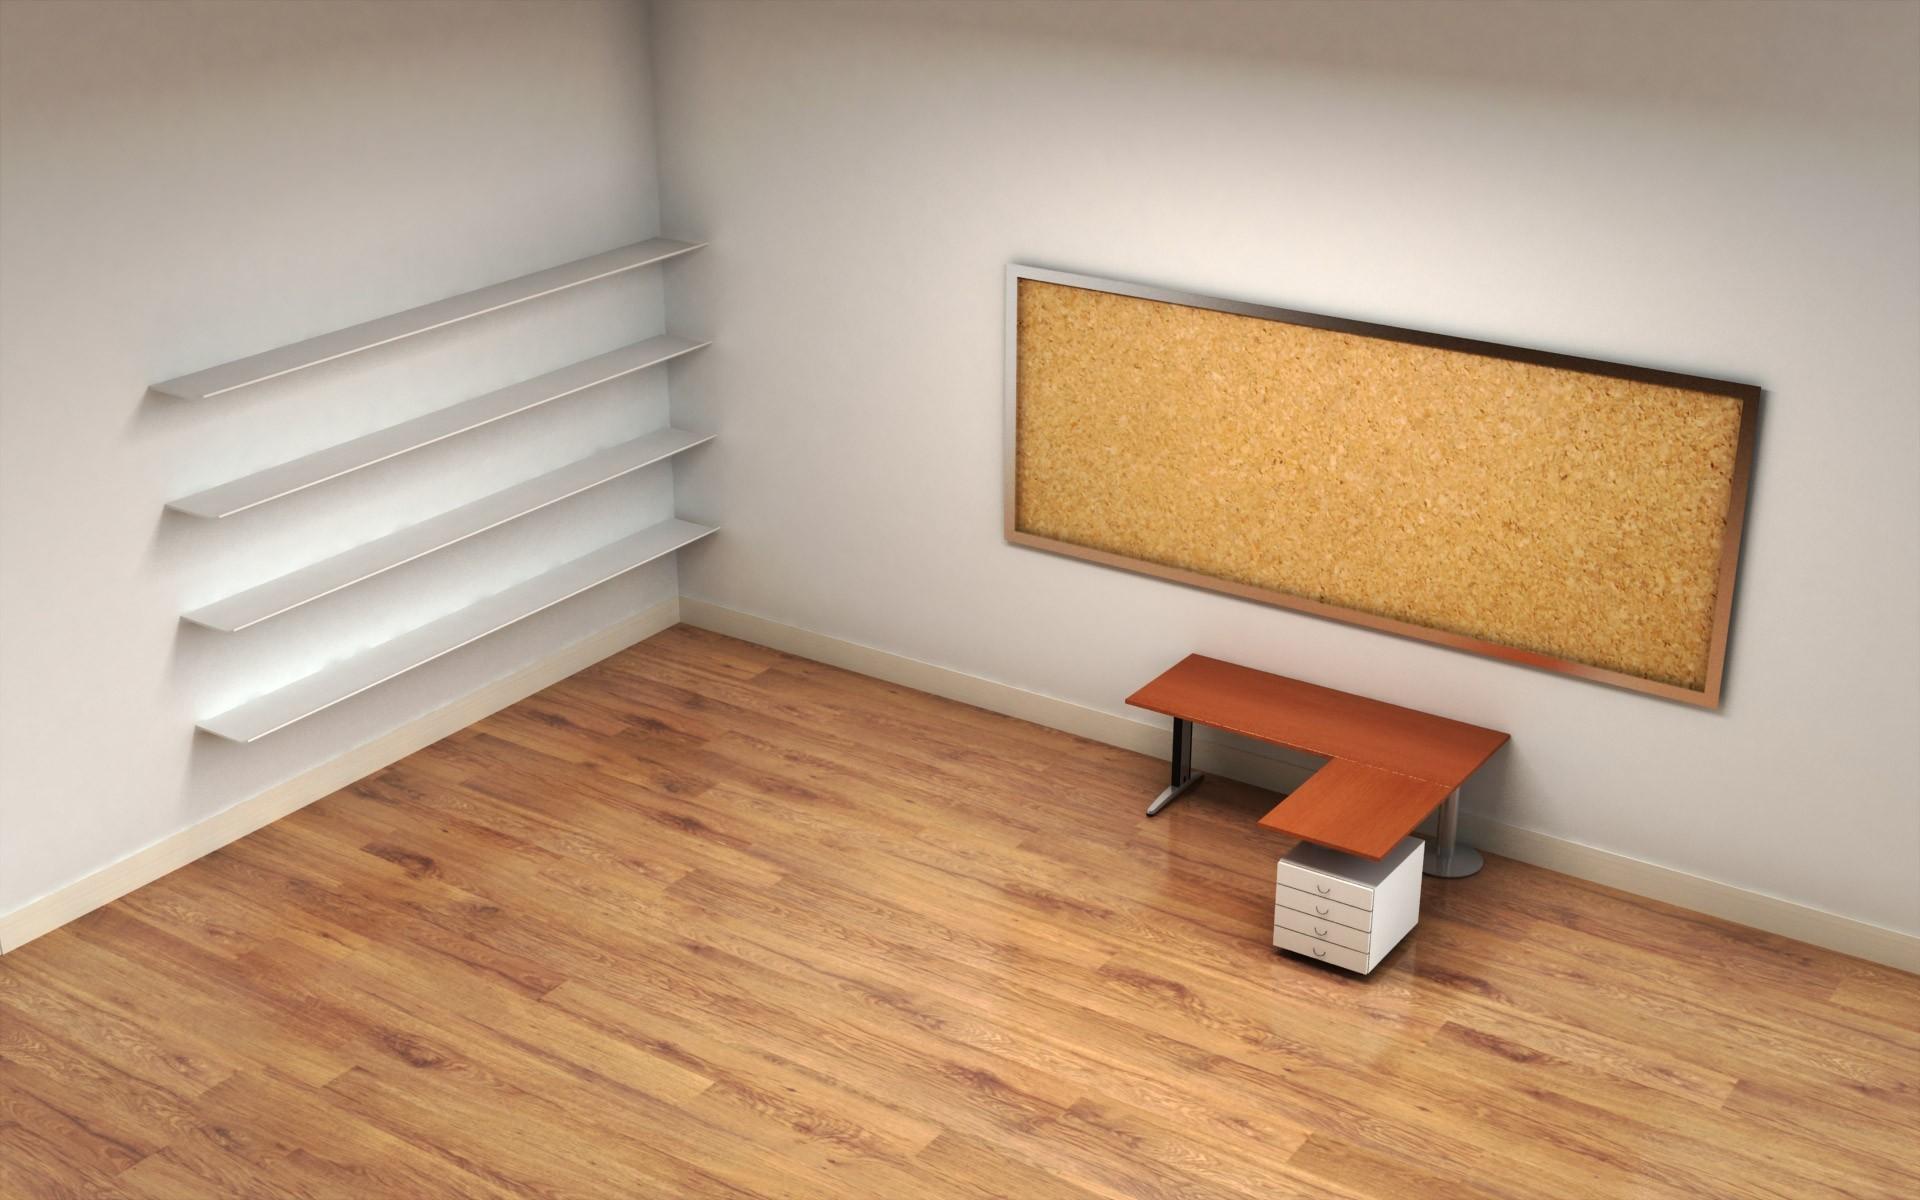 Shelf Desktop Background 1